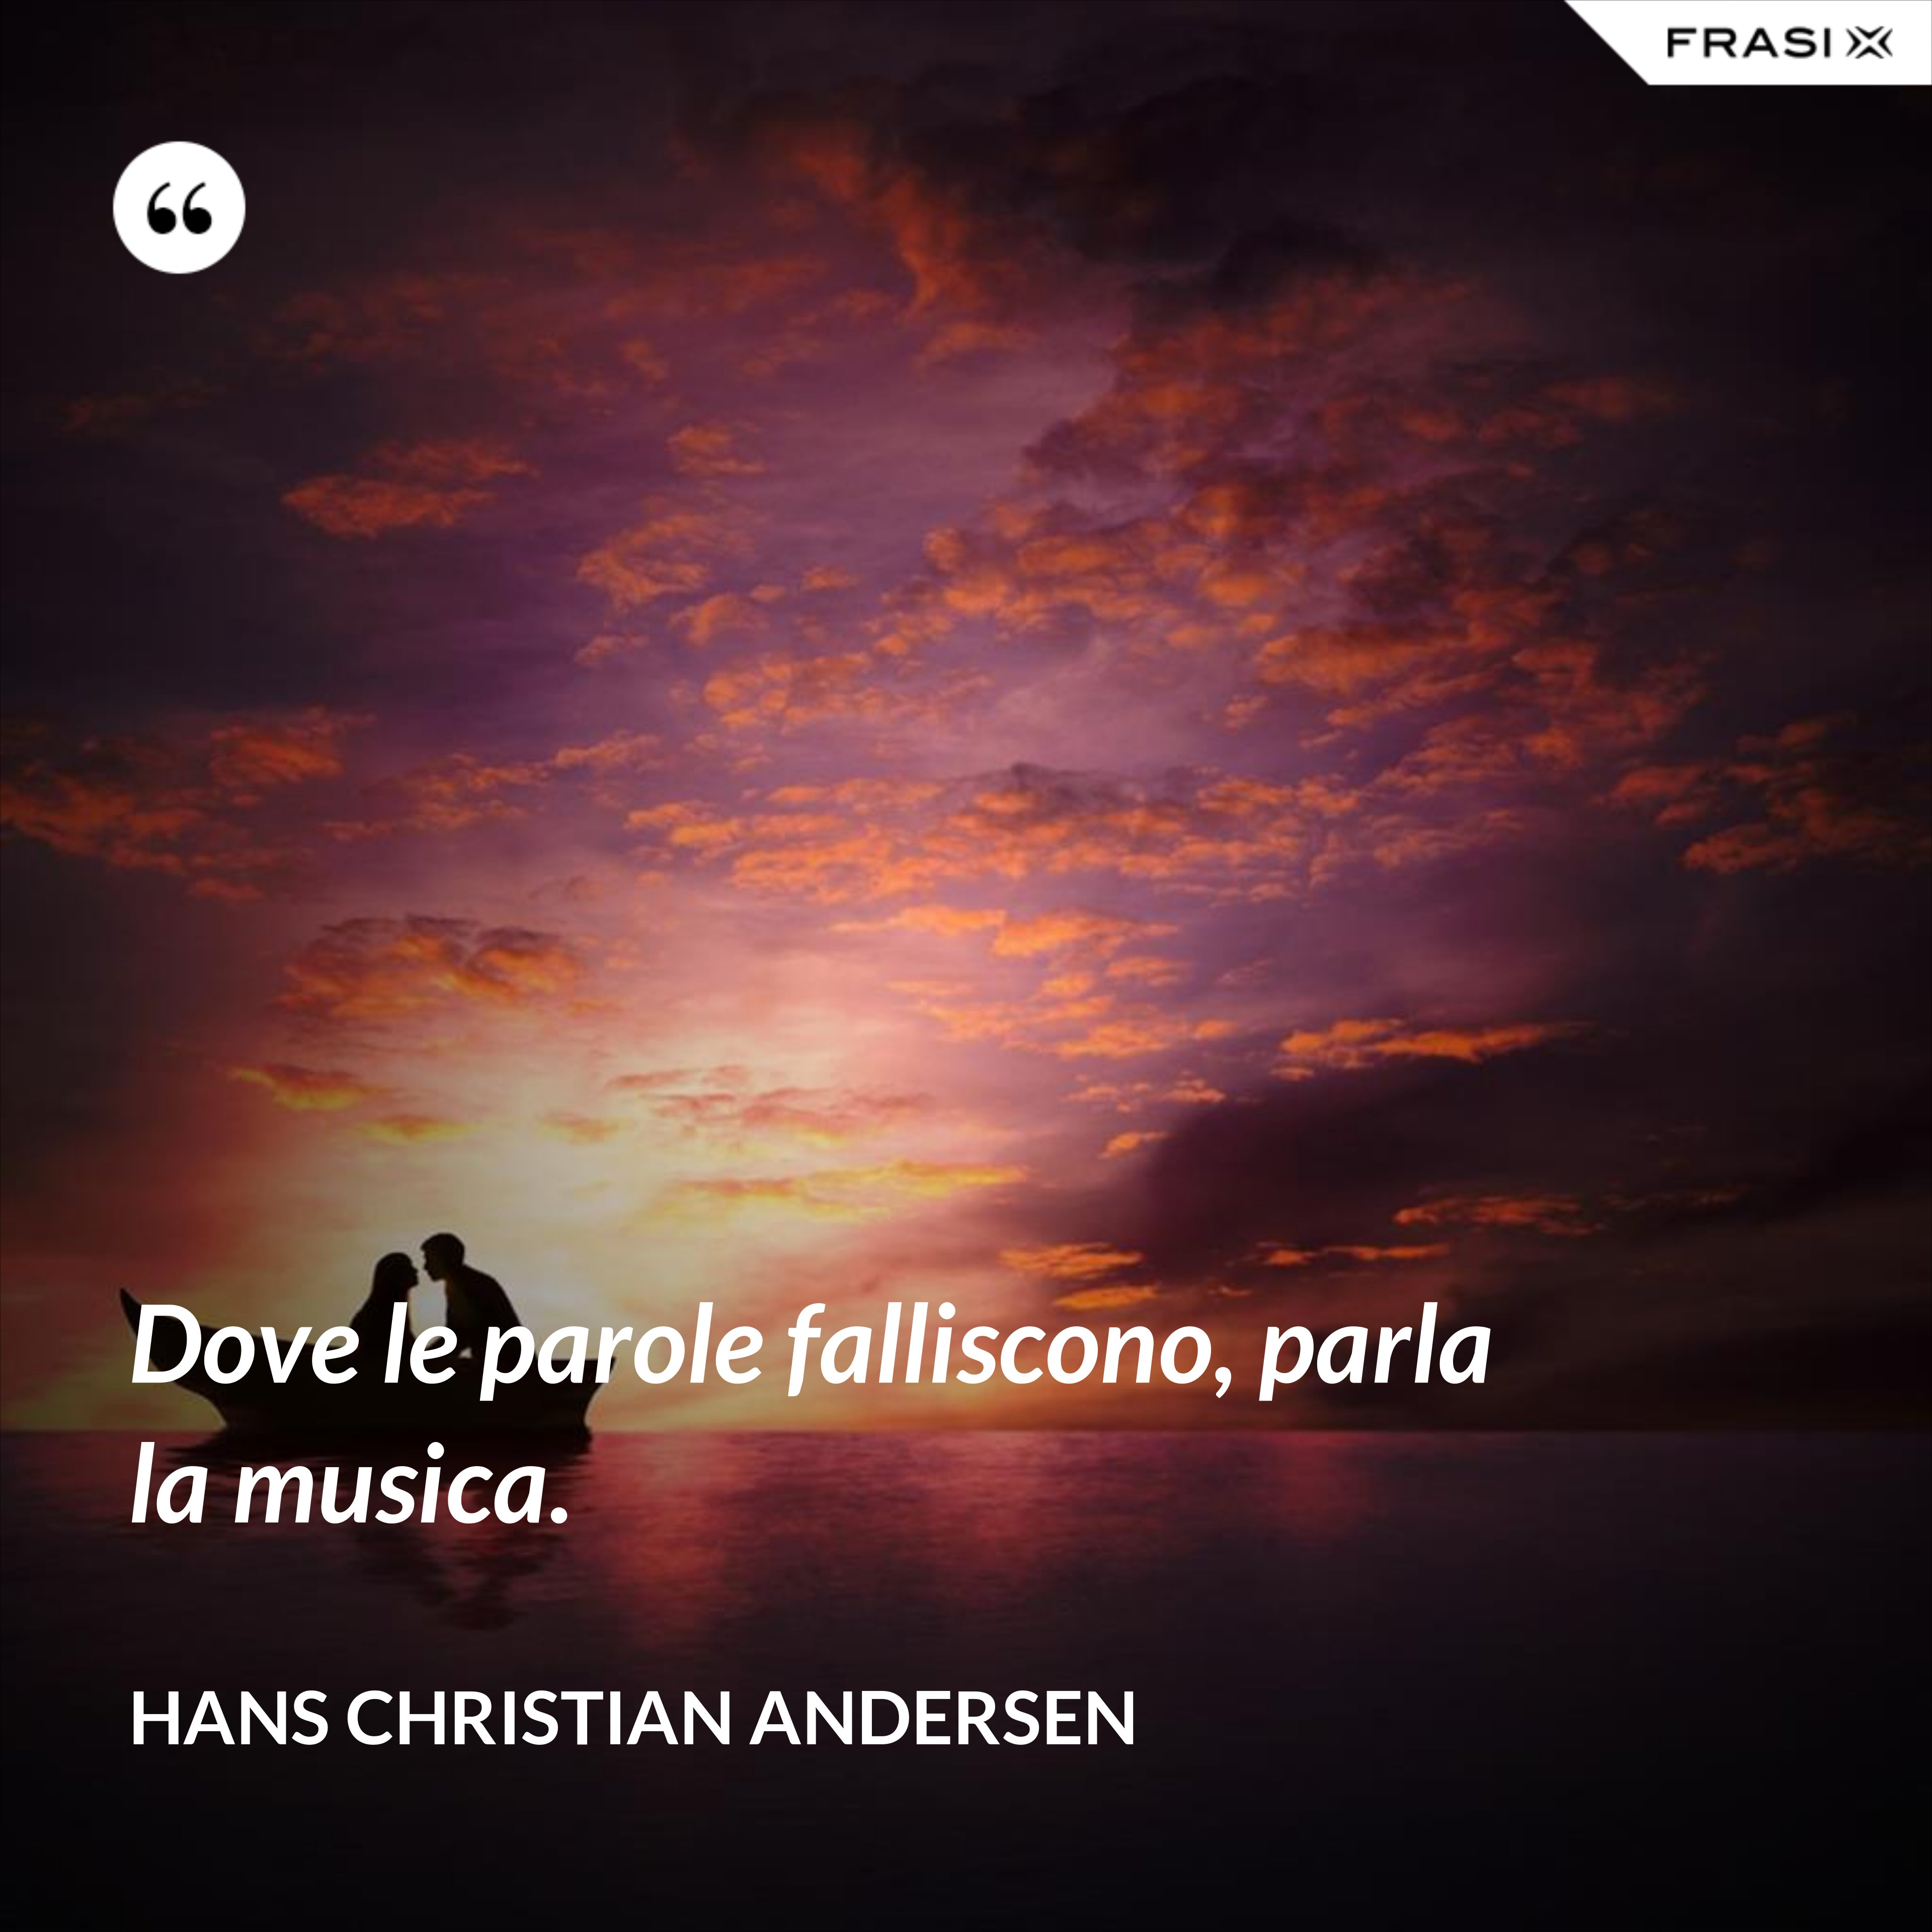 Dove le parole falliscono, parla la musica. - Hans Christian Andersen